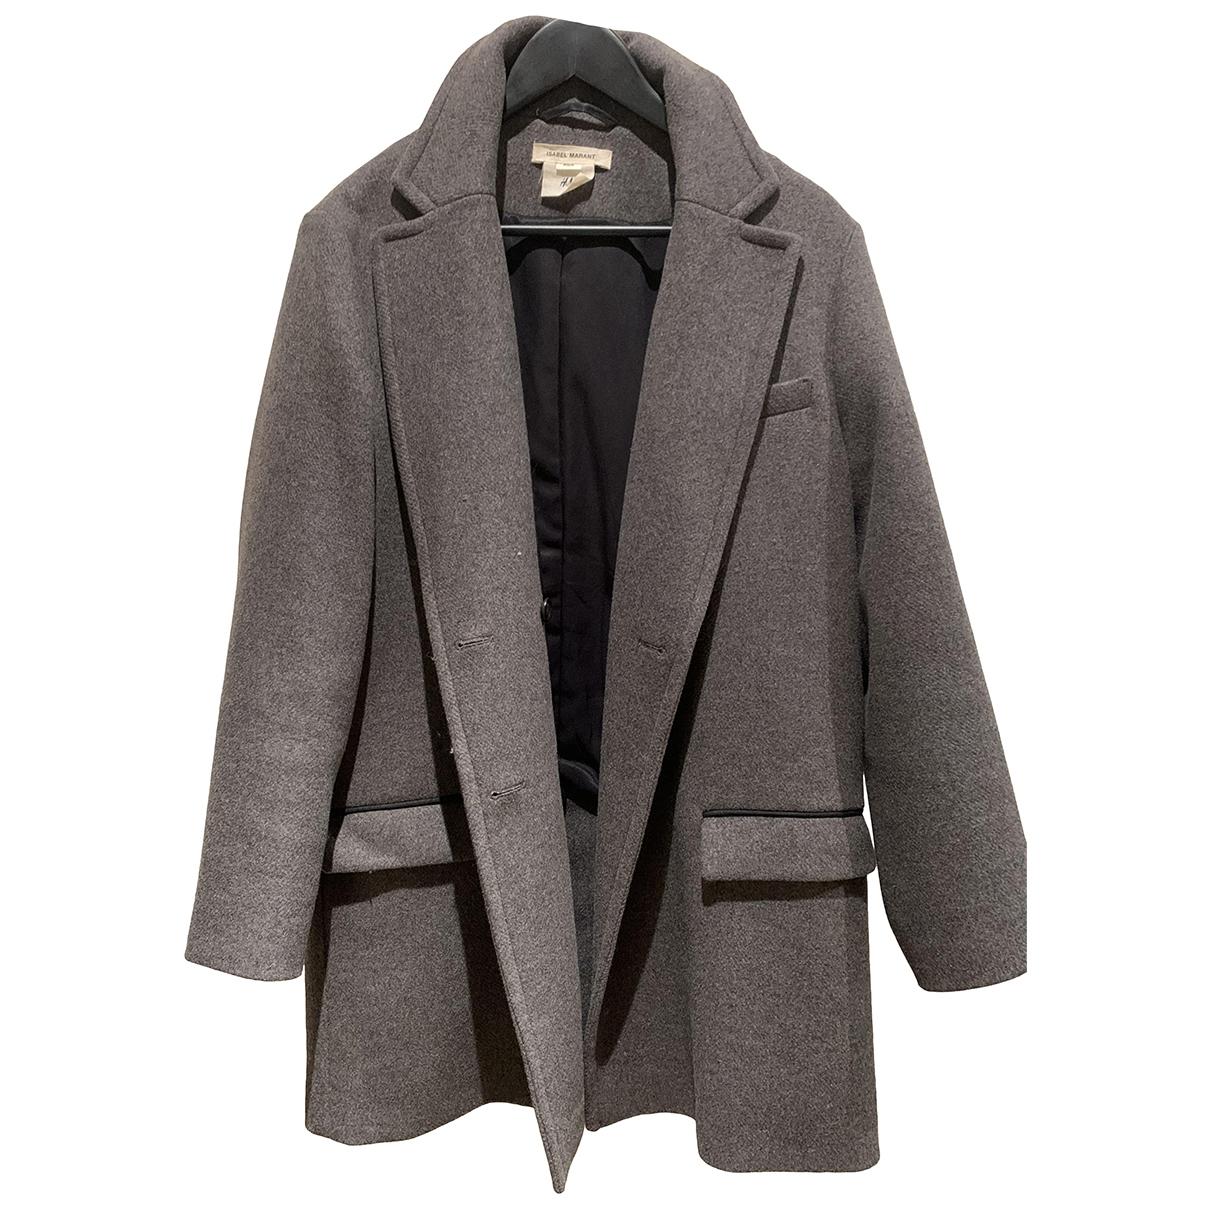 Isabel Marant Pour H&m \N Grey Wool coat for Women 36 FR